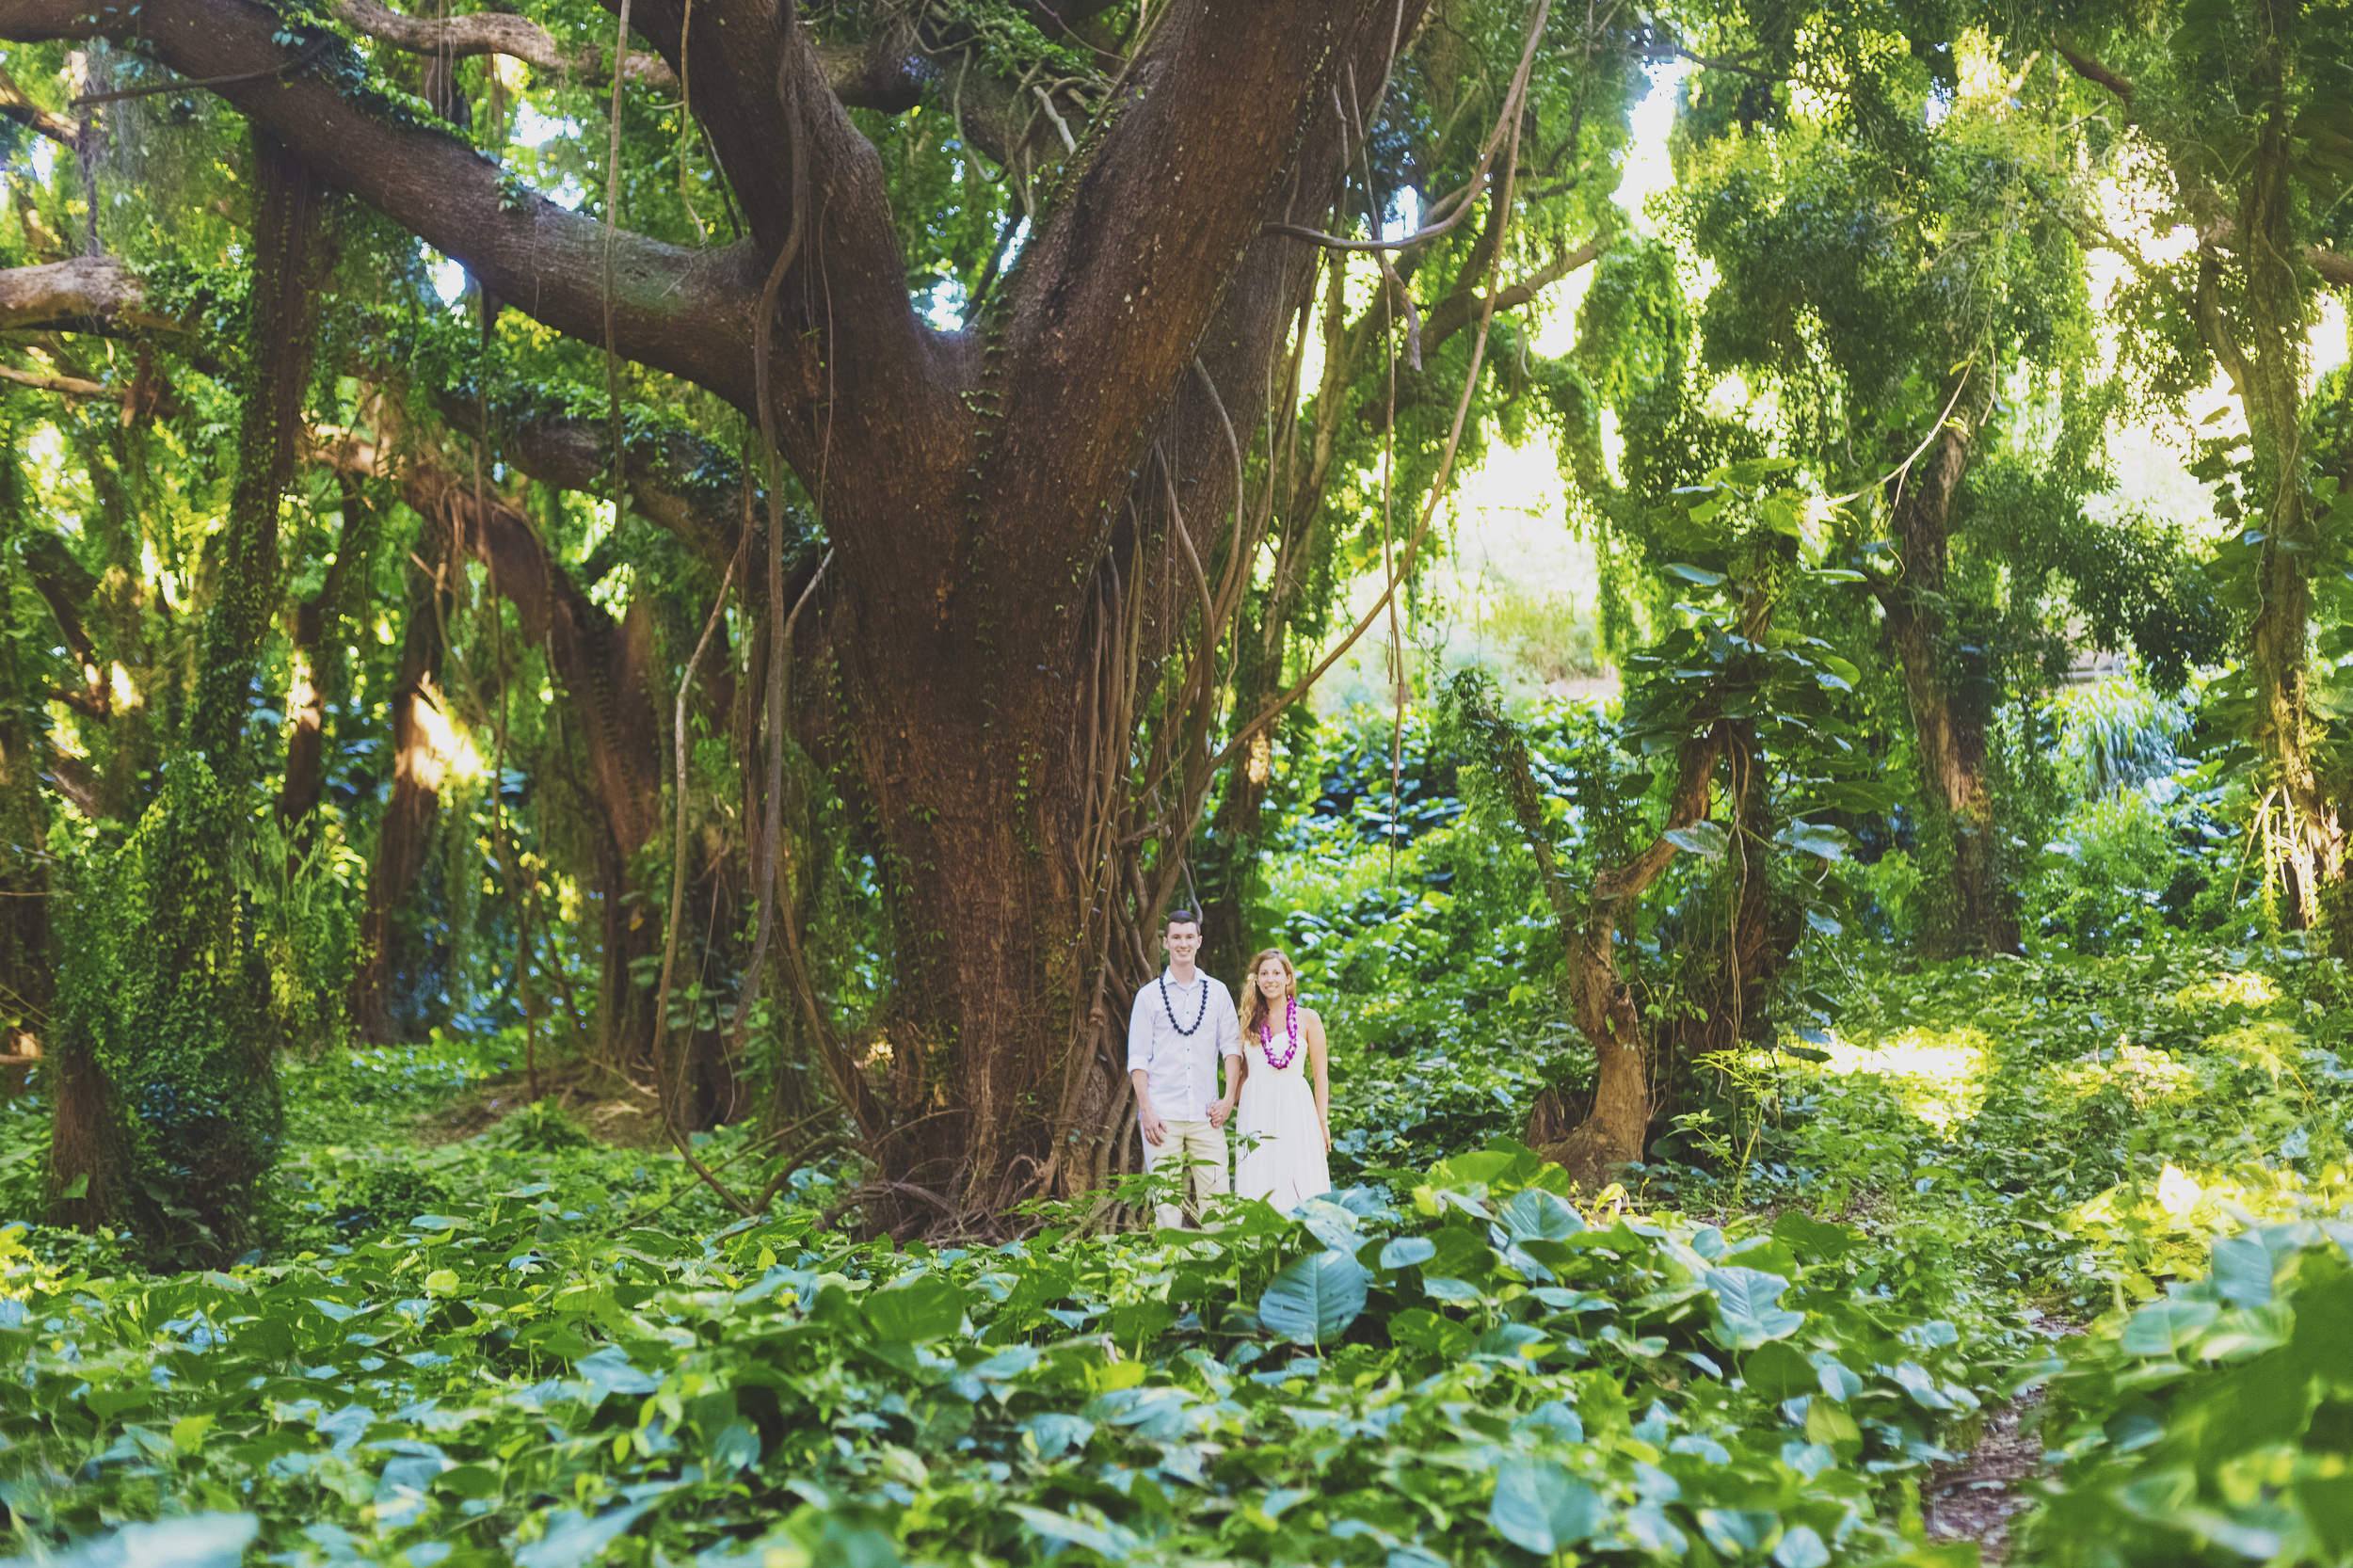 angie-diaz-photography-maui-honeymoon-hawaii-elopement-25.jpg